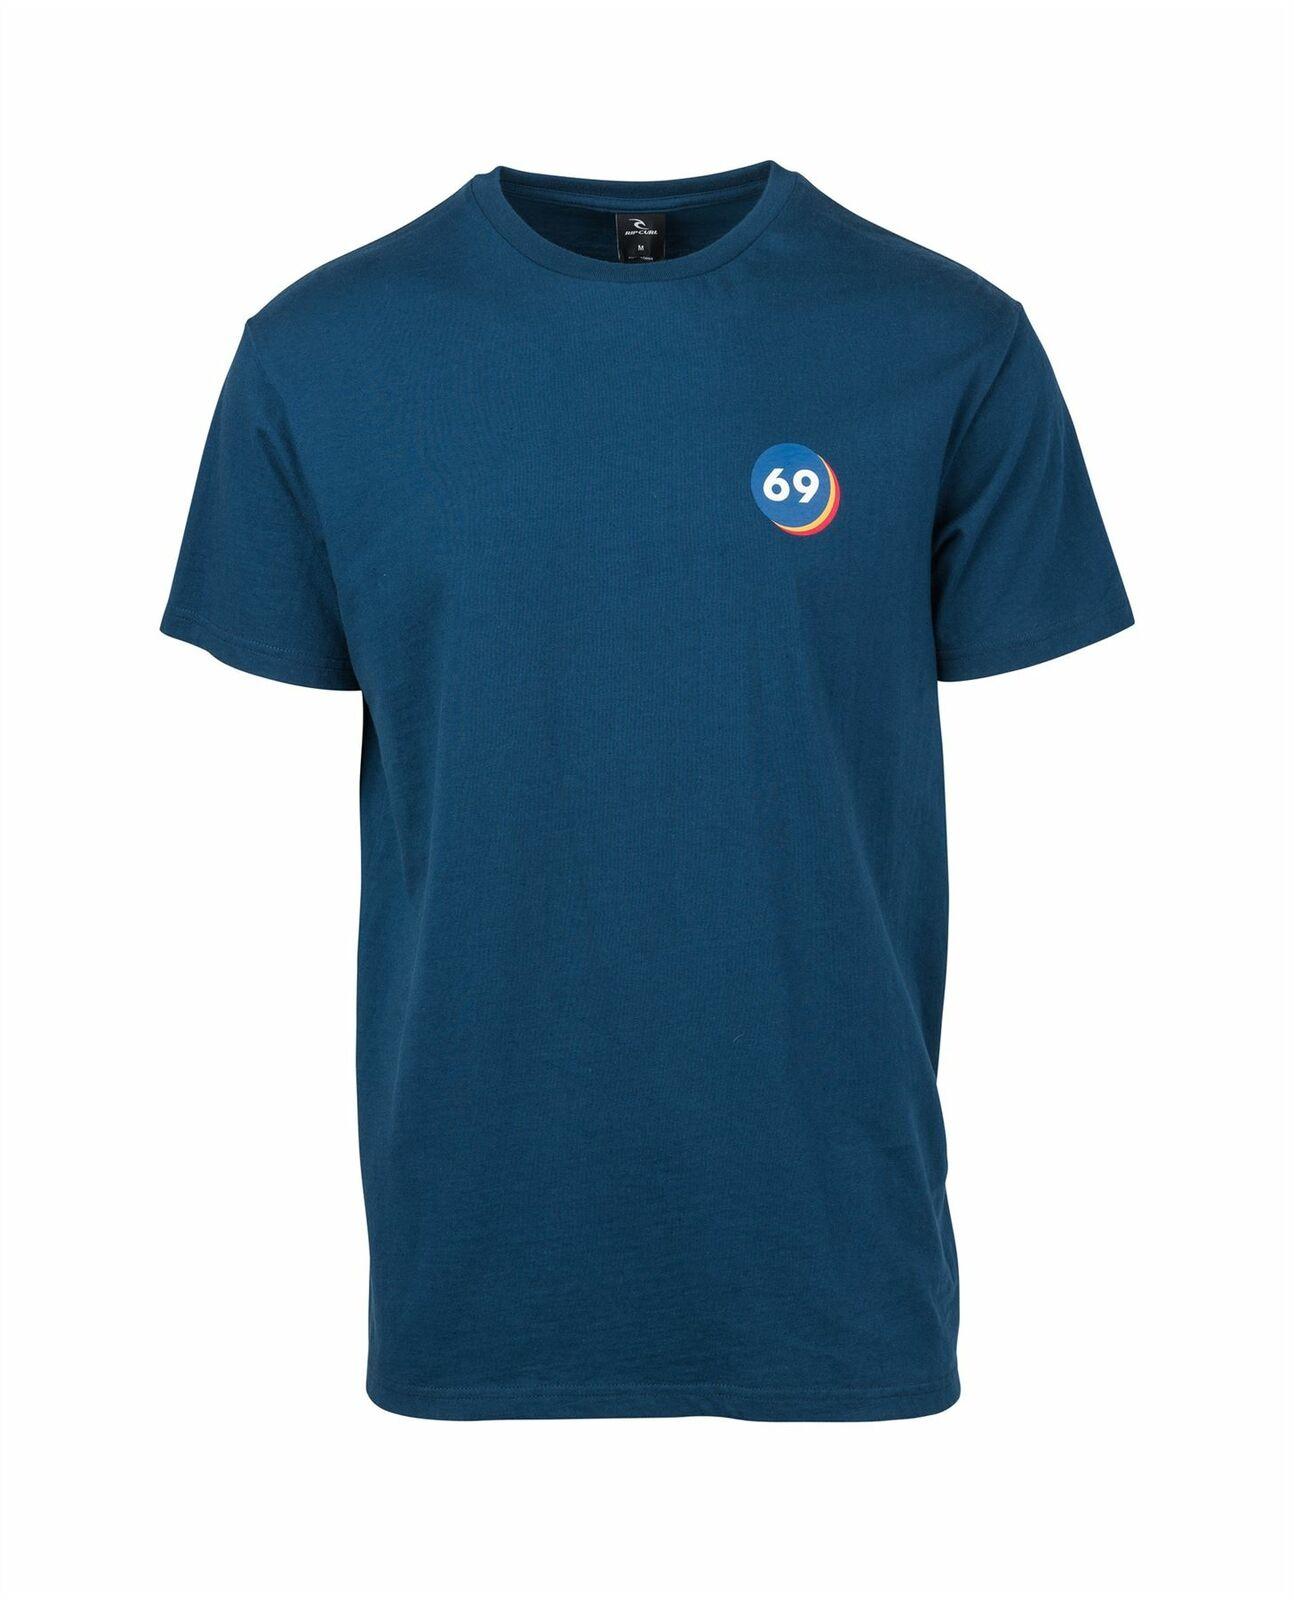 c3bc97ef Curl T-Shirt Rainbow Sign Rip ndznpq3657-Casual Shirts & Tops - www ...